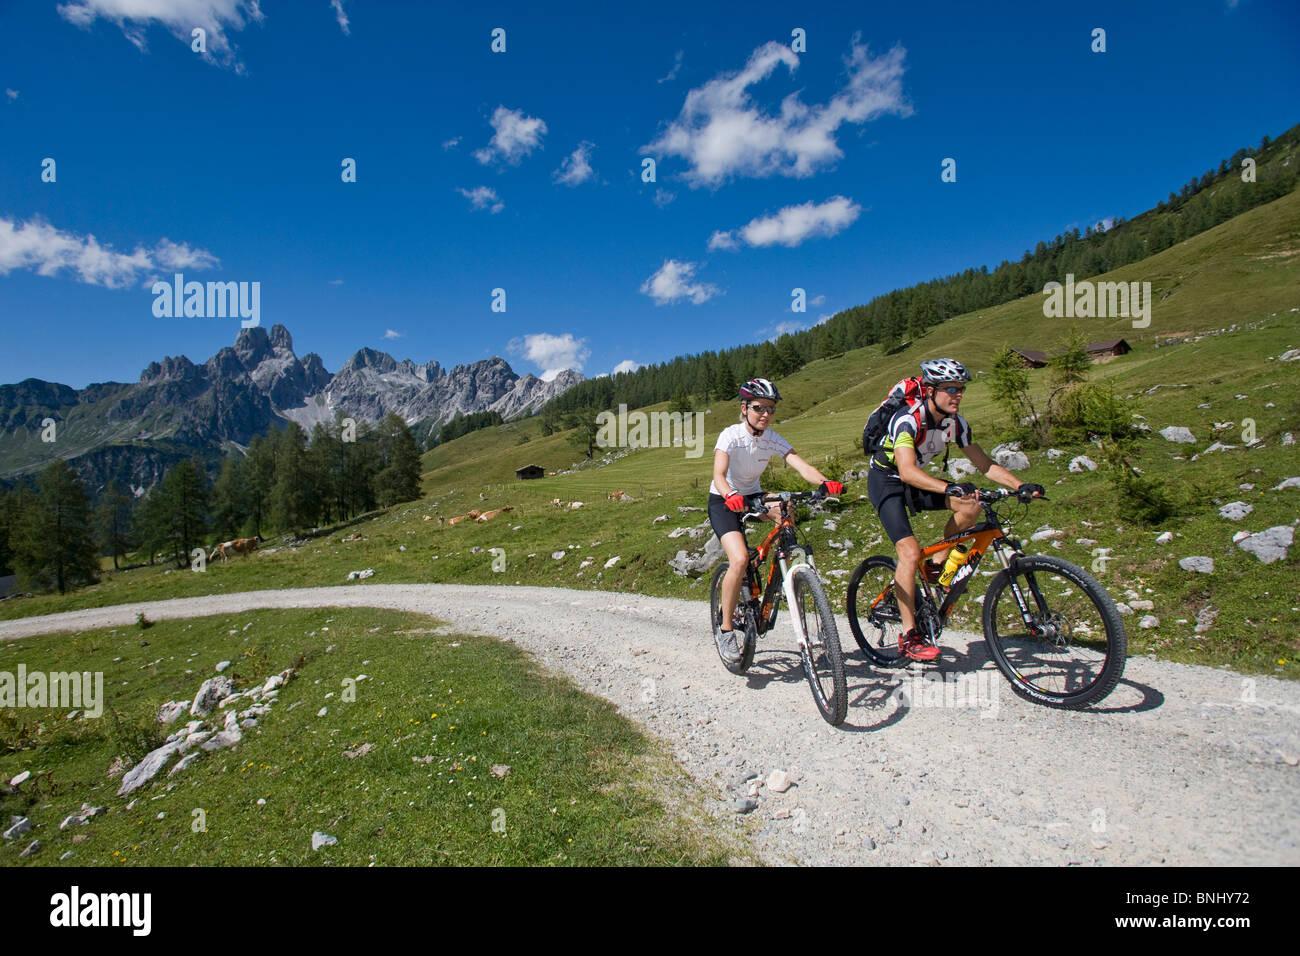 Bike Austria Filzmoos Salzburg summer alp mountain alps alpine mountains landscape scenery nature Bicycle Bicycles - Stock Image